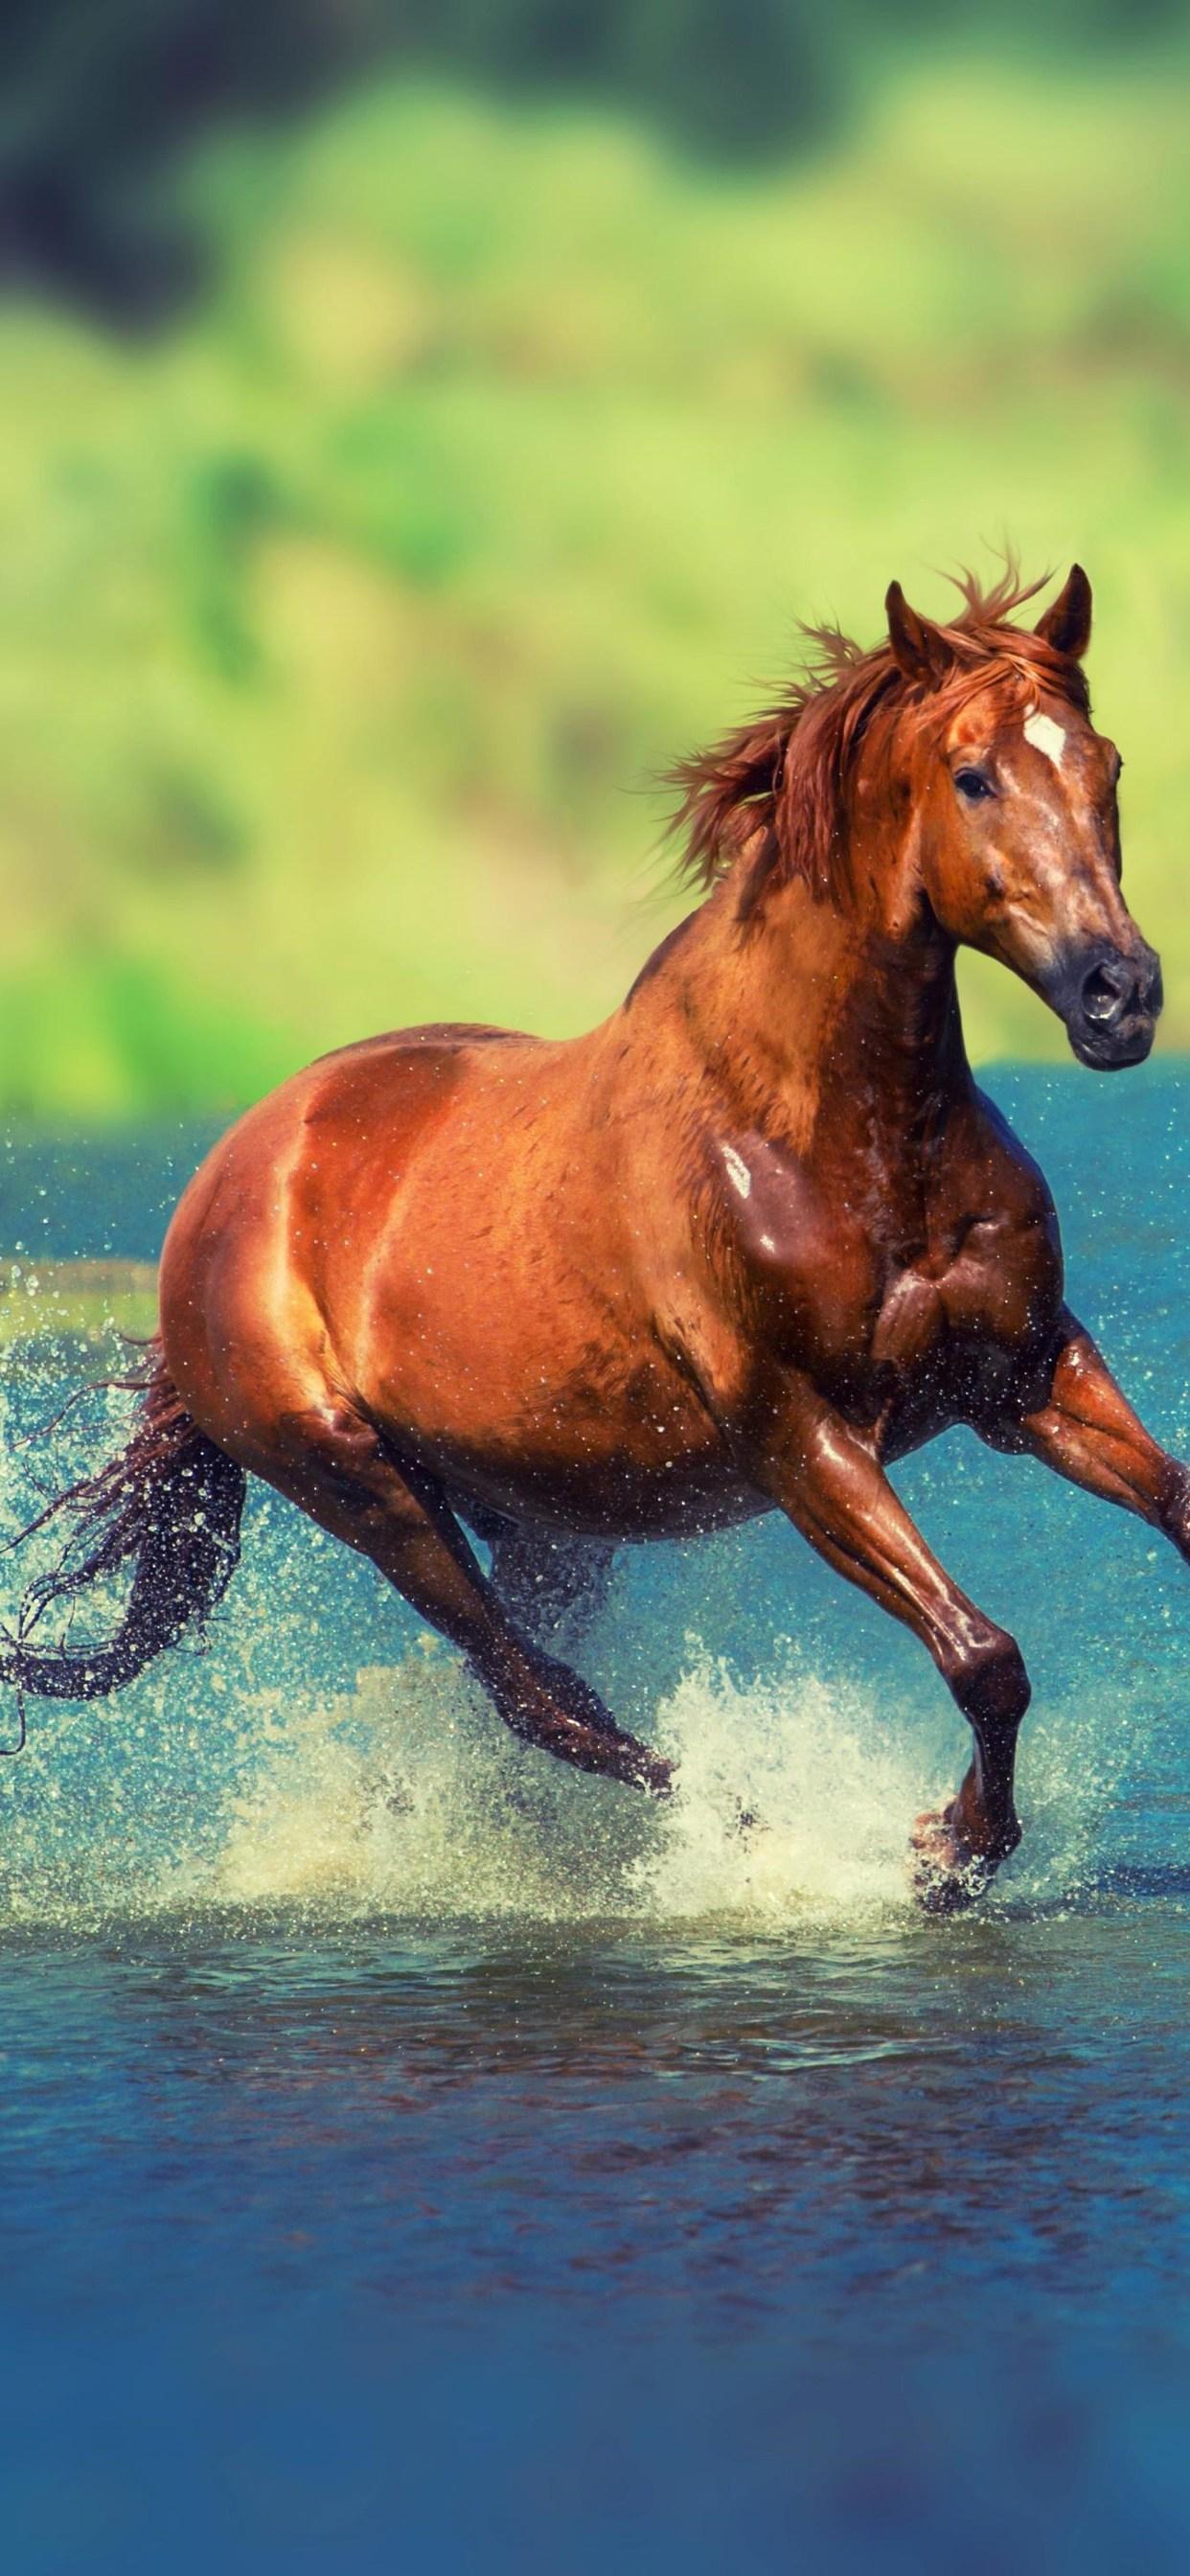 Running Horse In Water Wild Horses 1963929 Hd Wallpaper Backgrounds Download